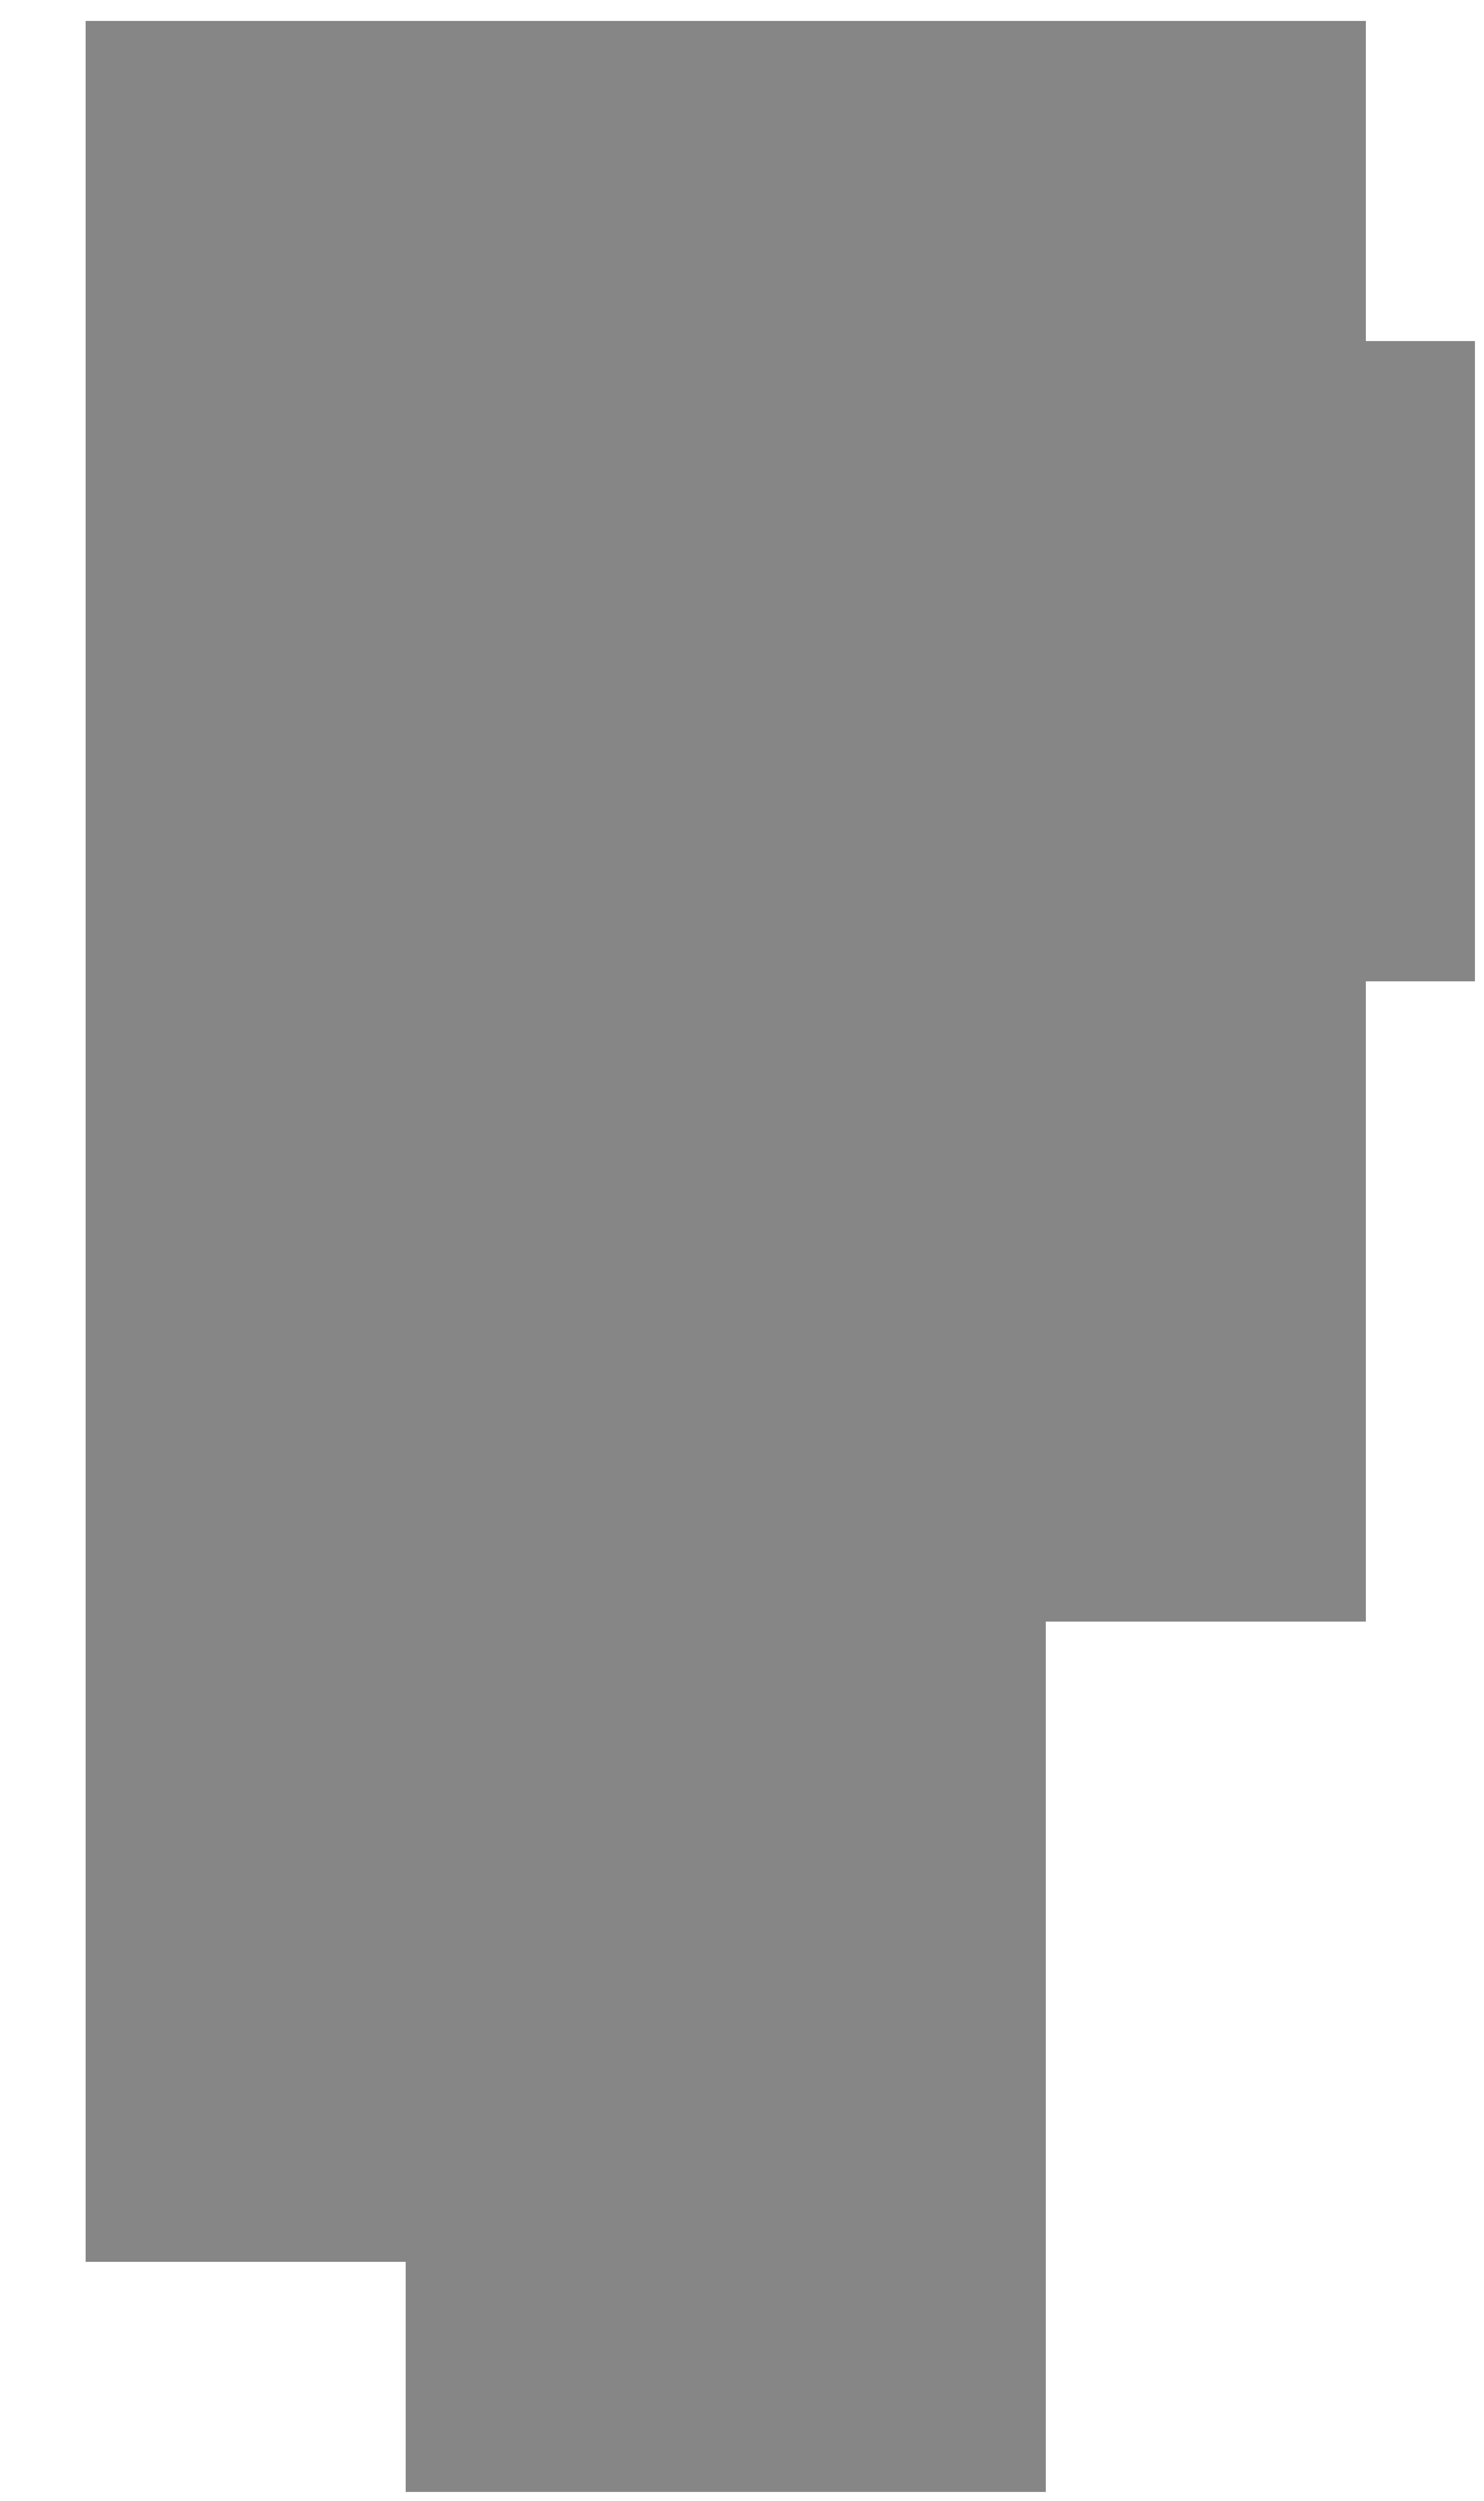 Smoke clip art transparent. Smoking clipart black and white